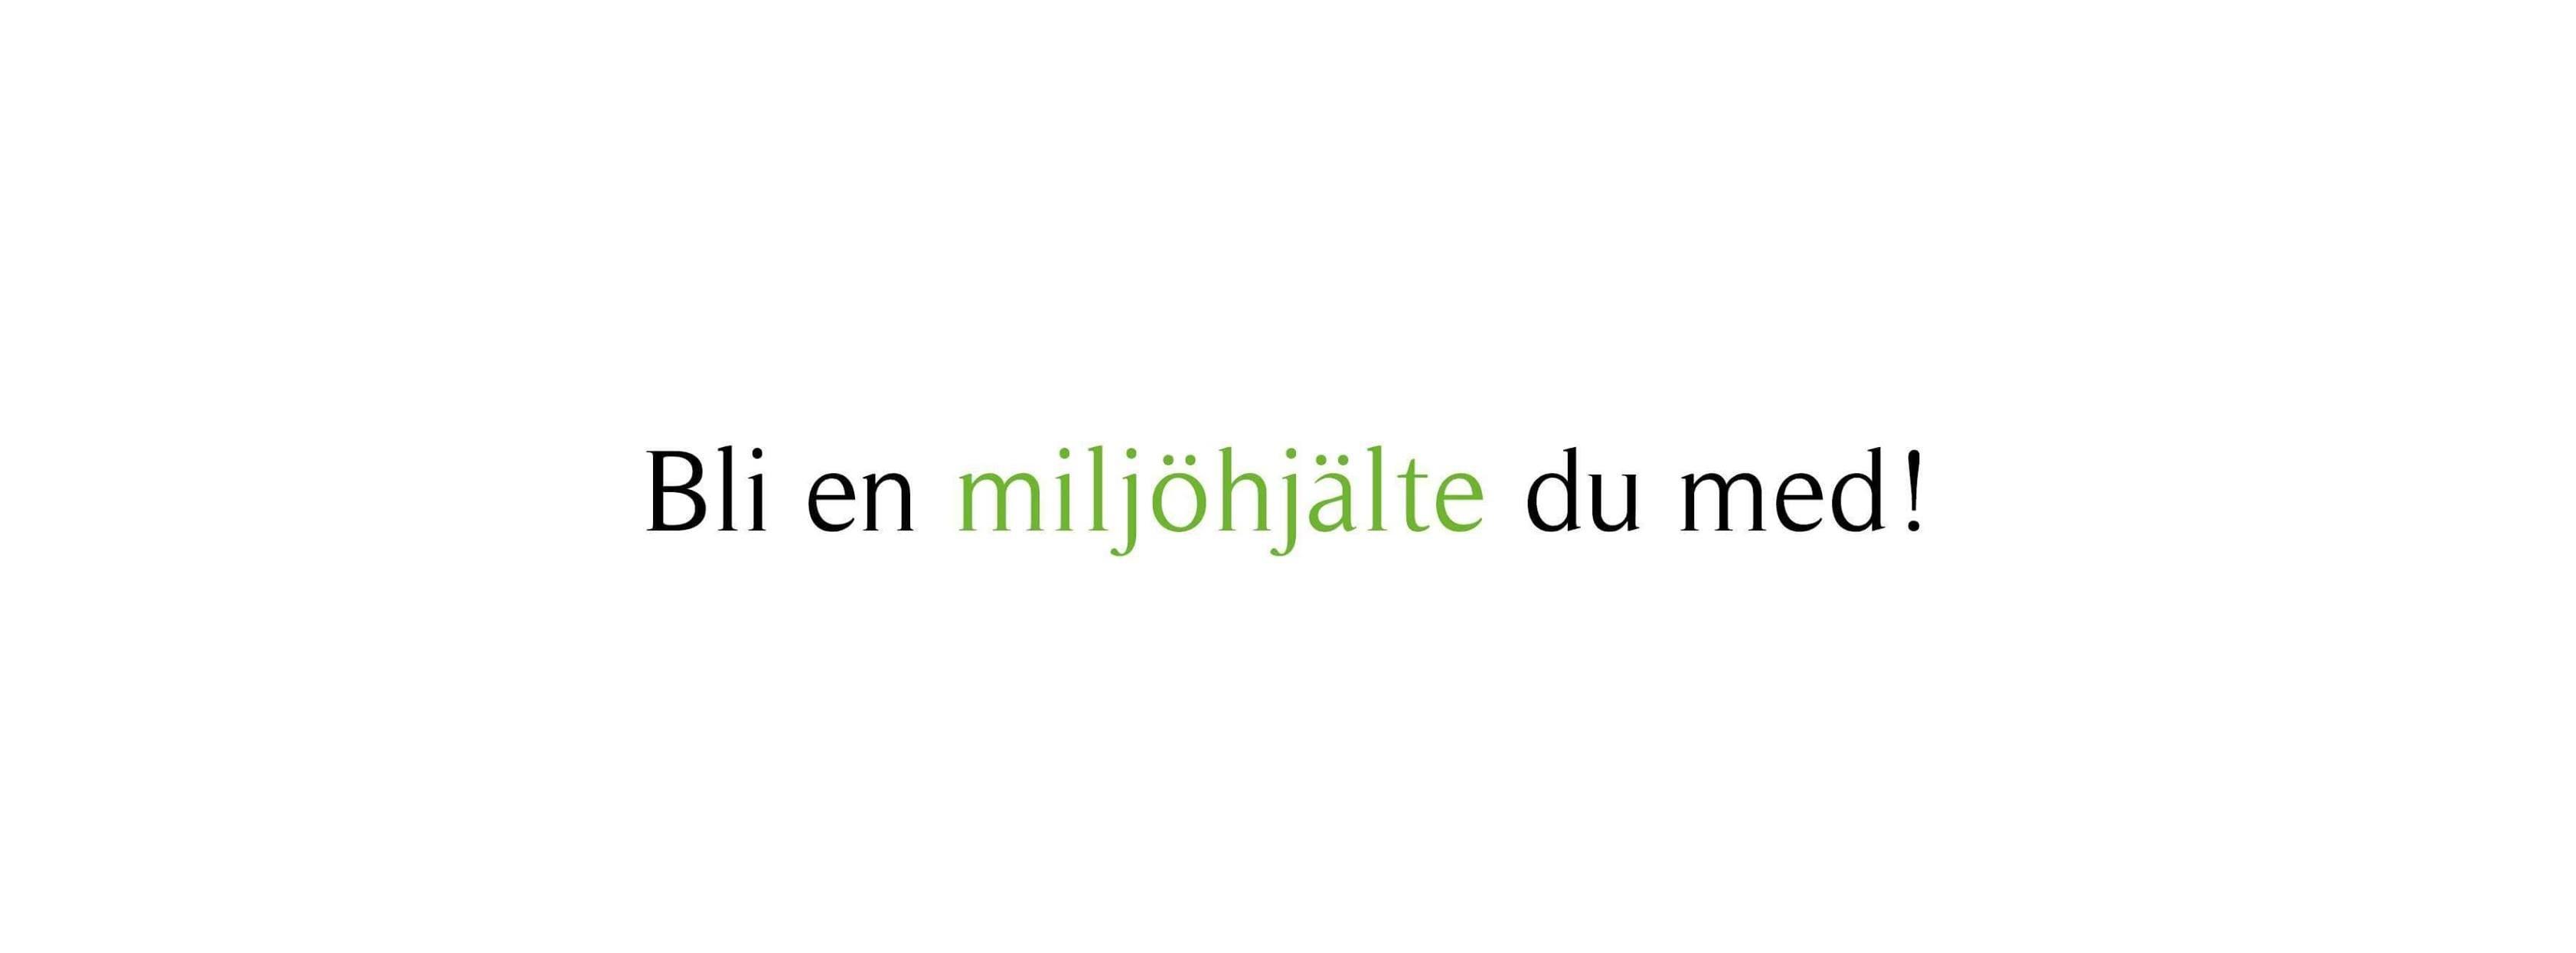 © Östersunds miljöhjältar, Bli en miljöhjälte du med